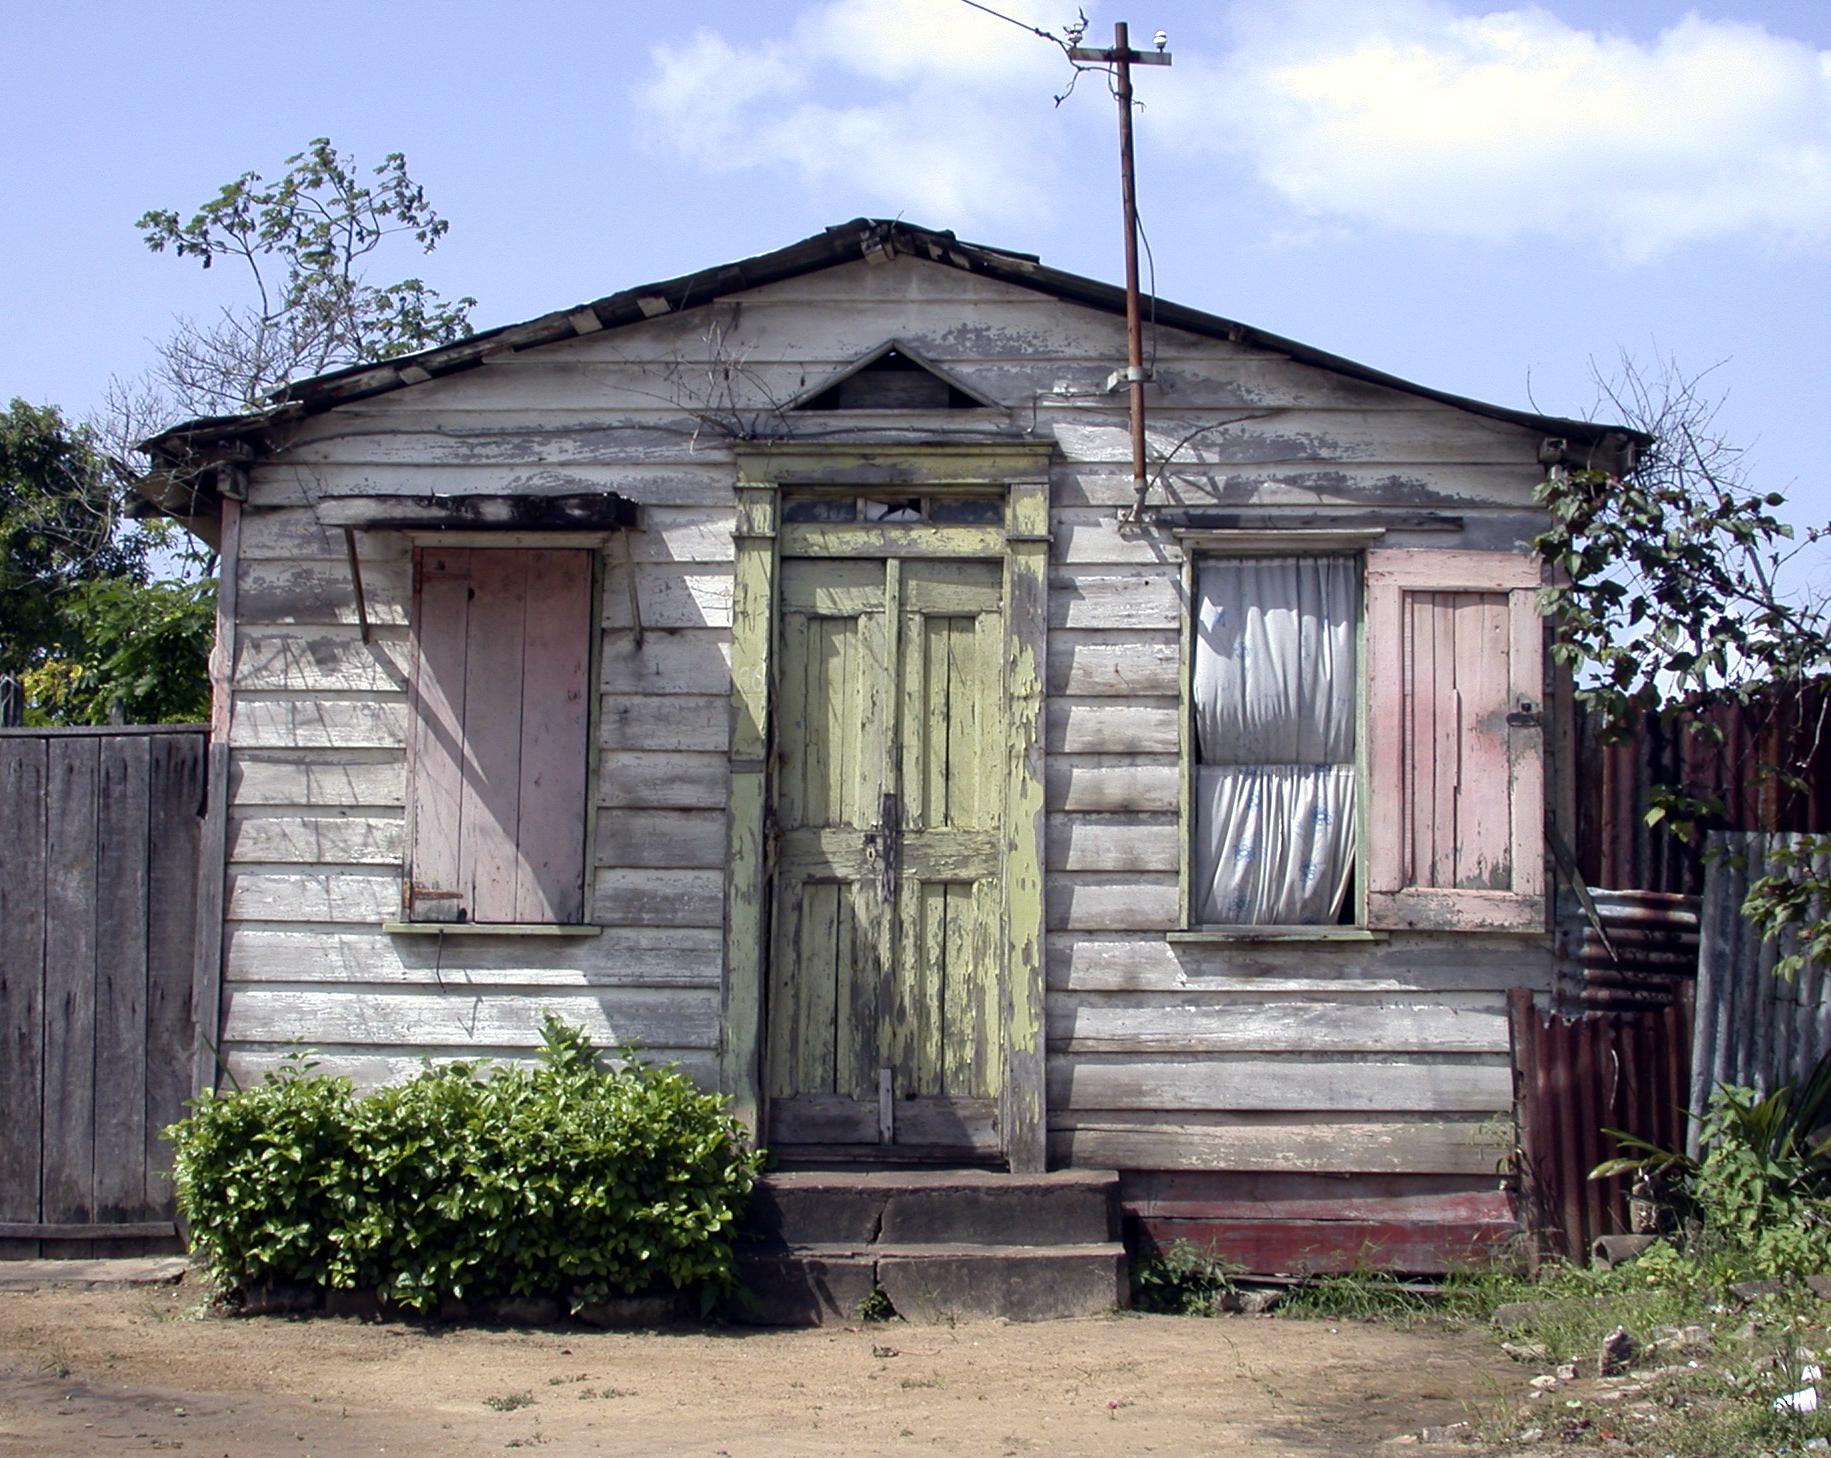 Suriname, 2002